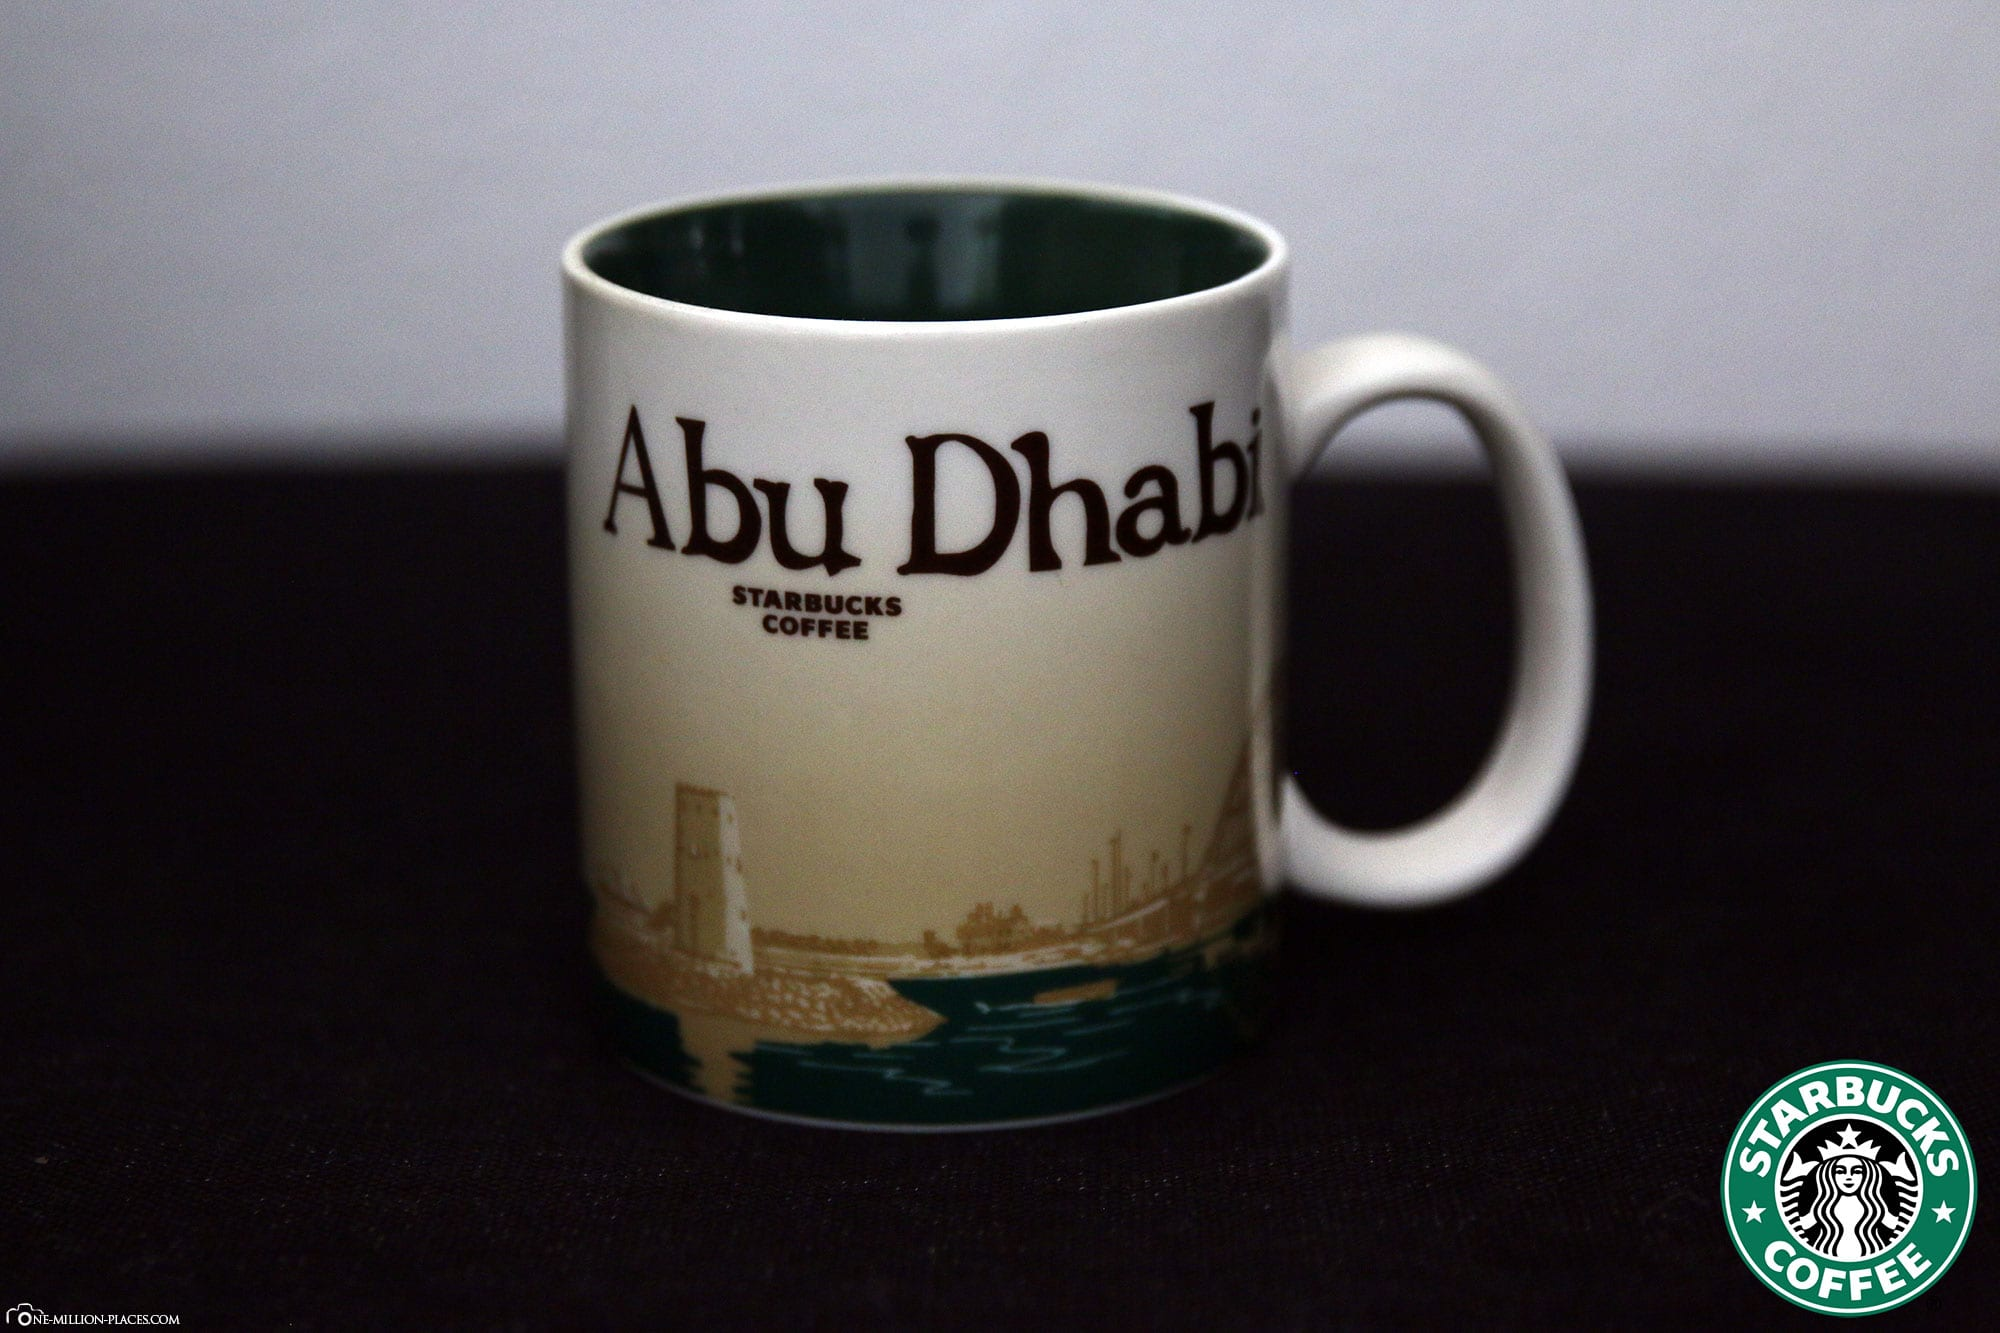 Abu Dhabi, Starbucks Cup, Global Icon Series, City Mugs, Collection, United Arab Emirates, TravelReport